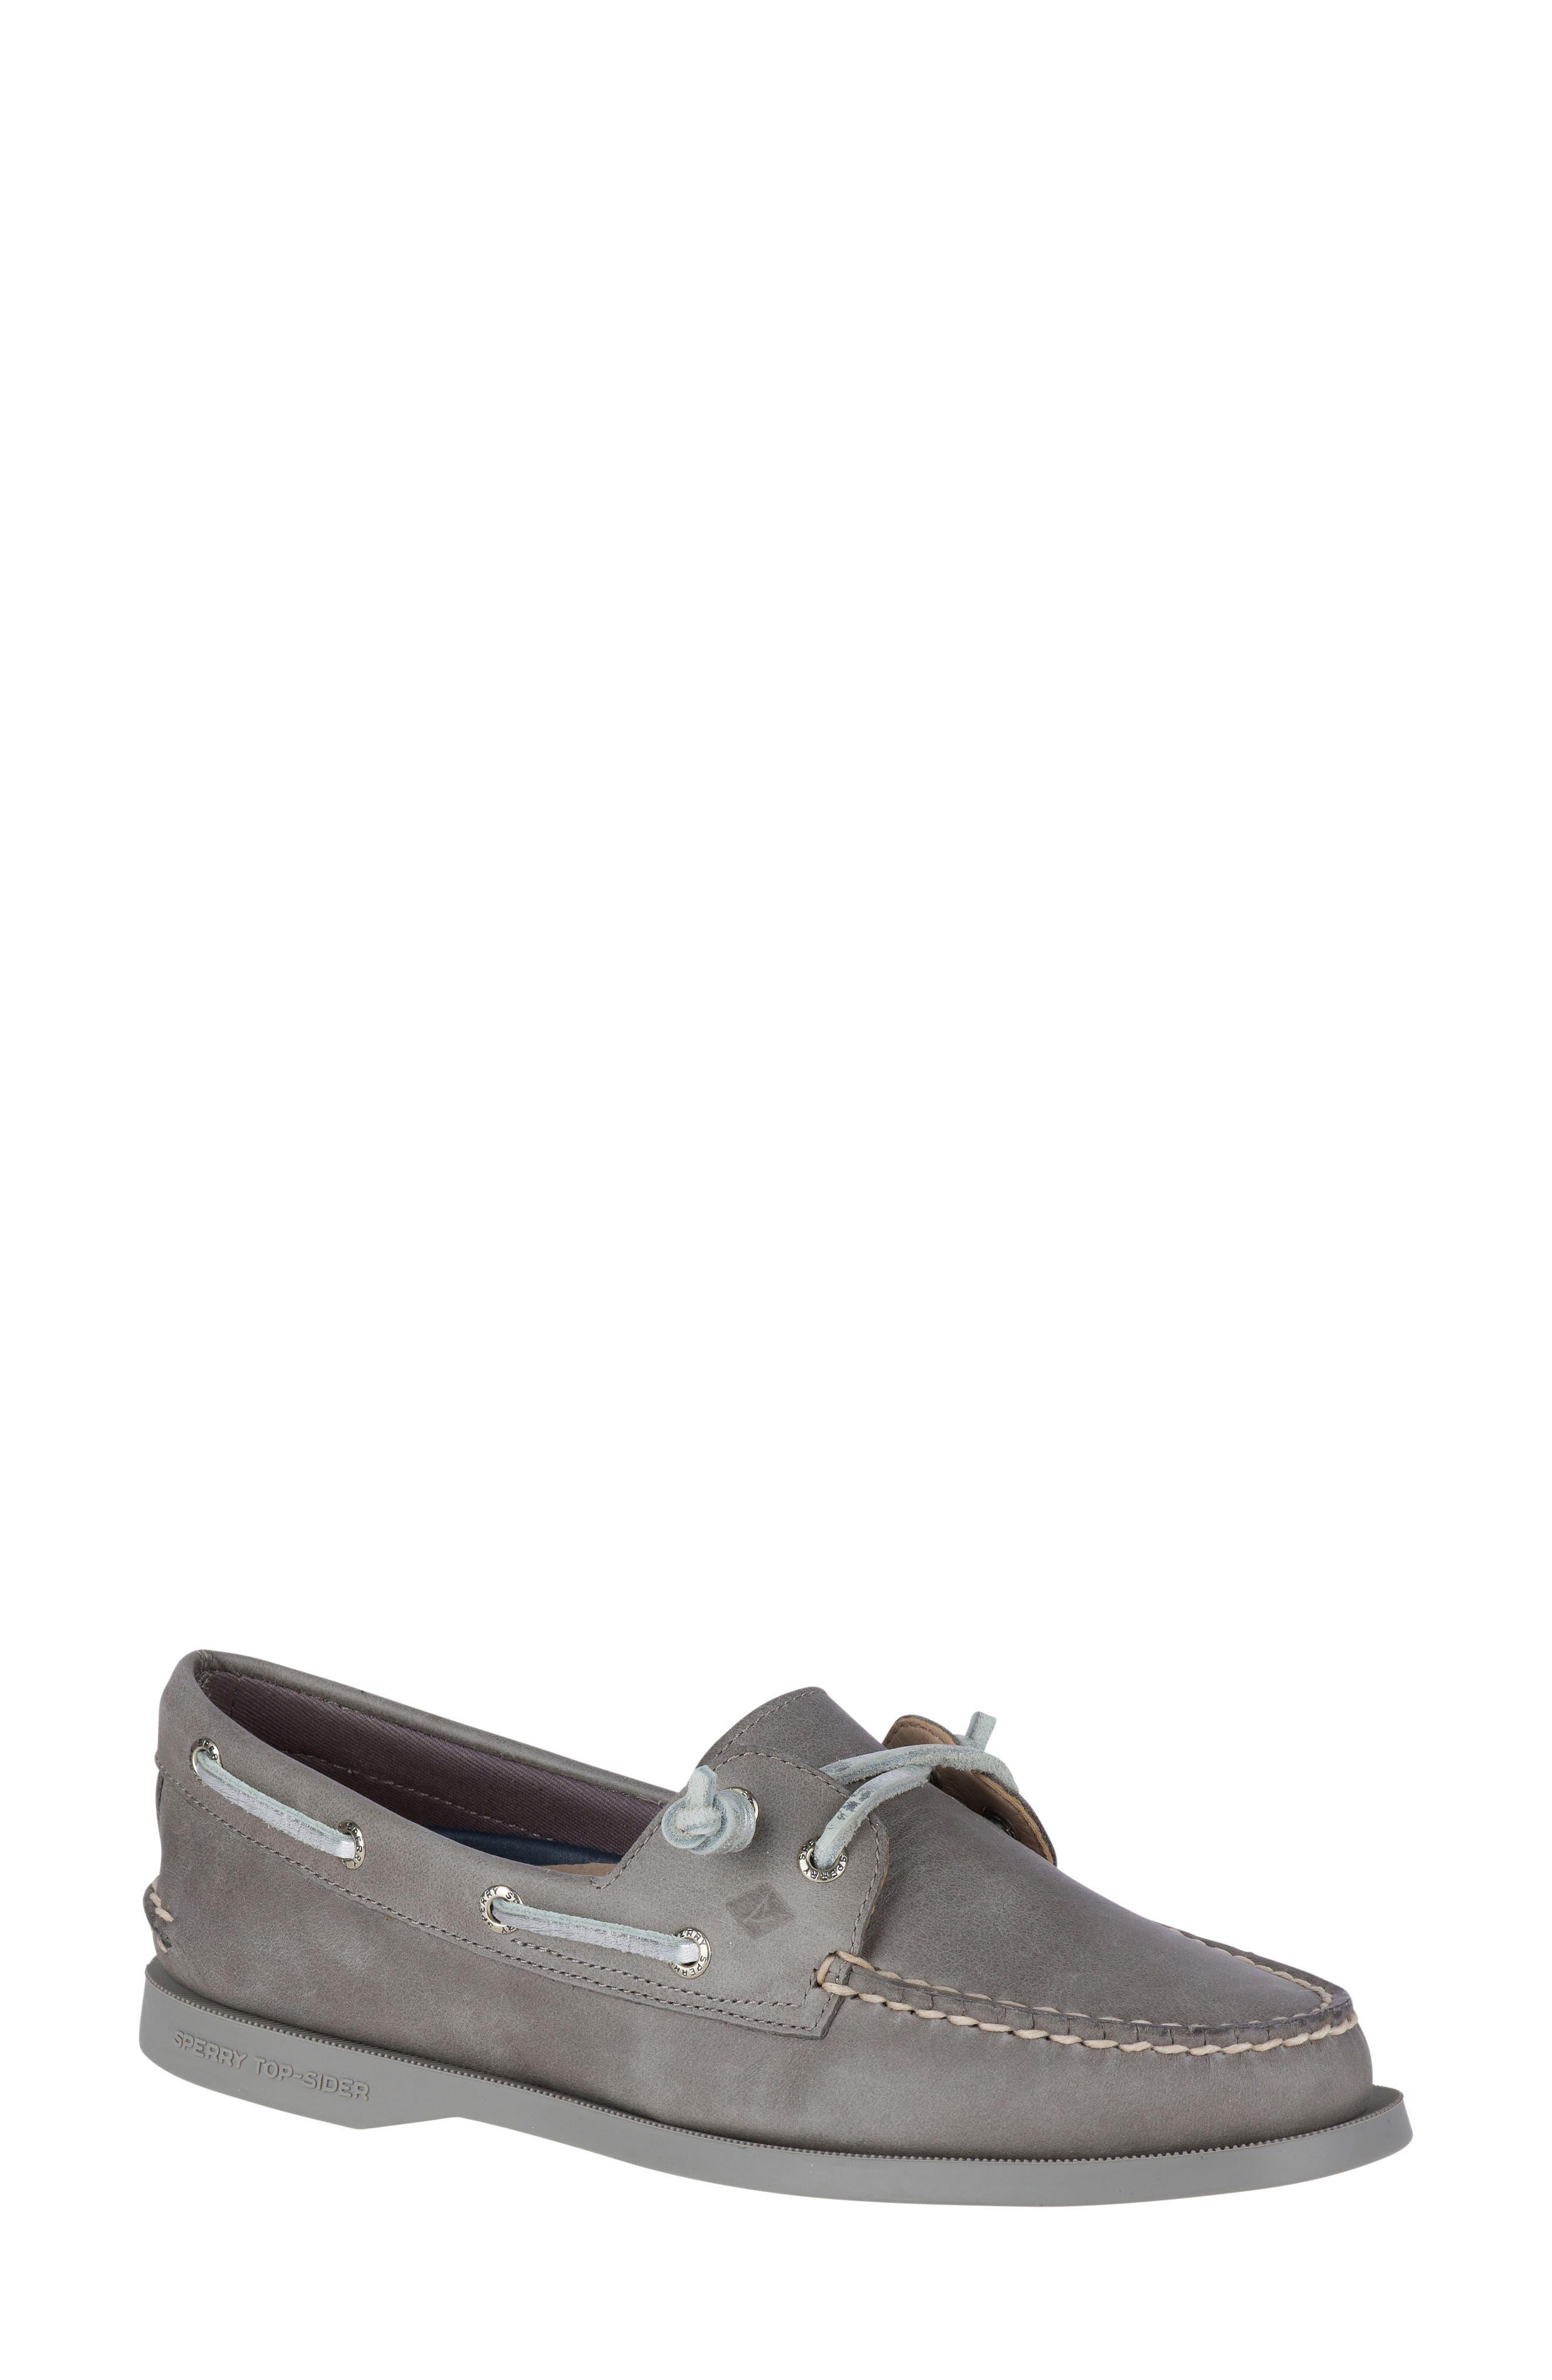 Vida Boat Shoe,                         Main,                         color, Driftwood Leather